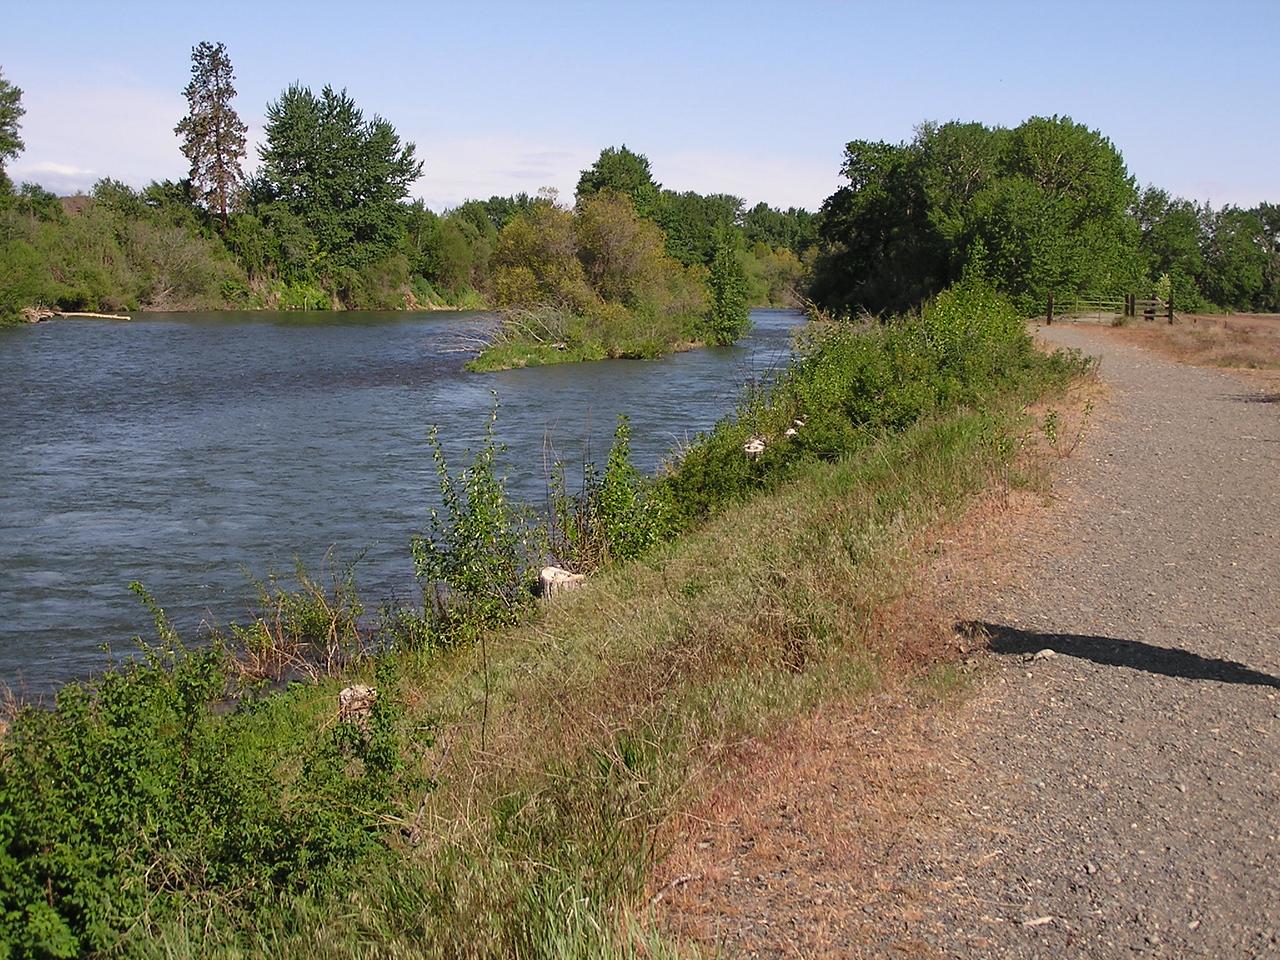 07 05 13 Eburg Riverfront 017